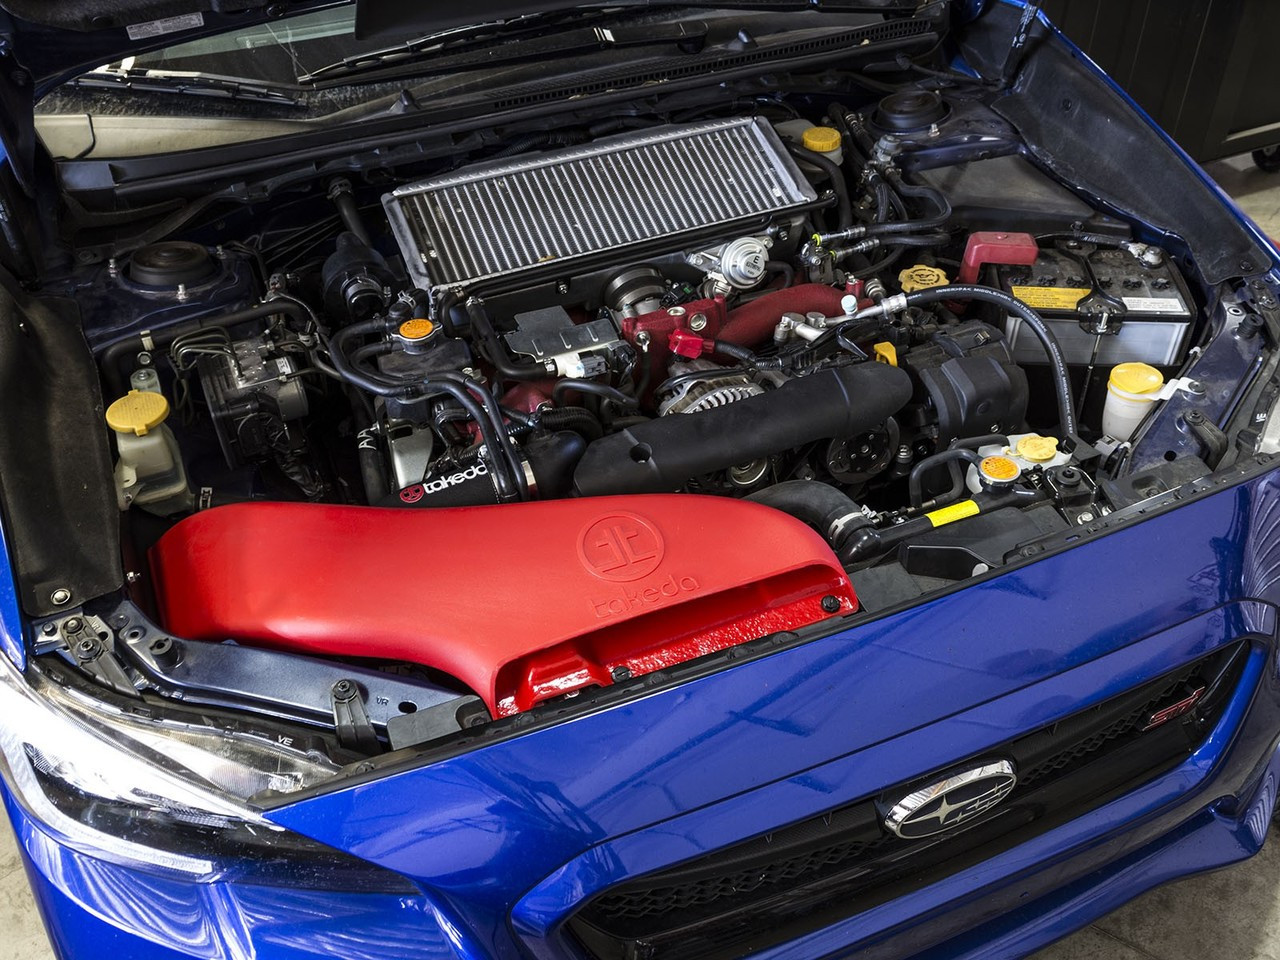 aFe Power TA-4306B-D Takeda Stage-2 Pro DRY S Cold Air Intake System 15-17 Subaru WRX STI H4-2.5L